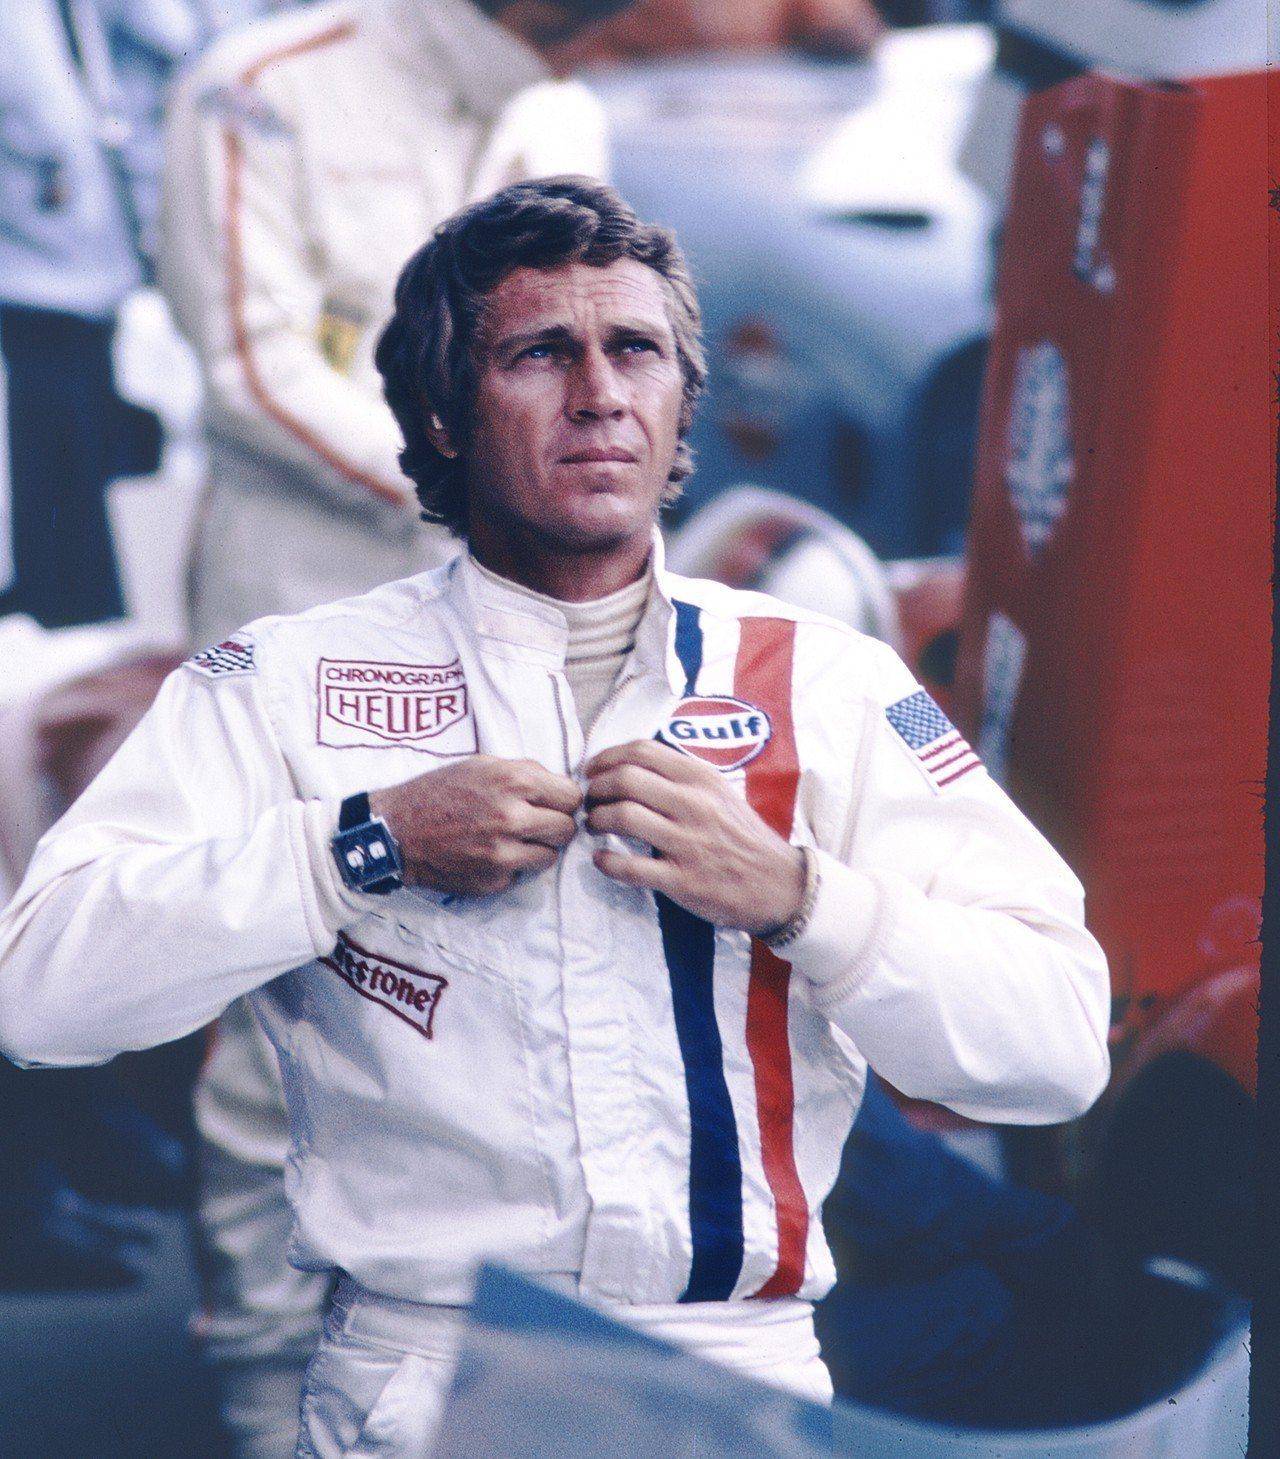 Steve McQueen於電影《Le Mans極速狂飆》中配戴泰格豪雅MONA...